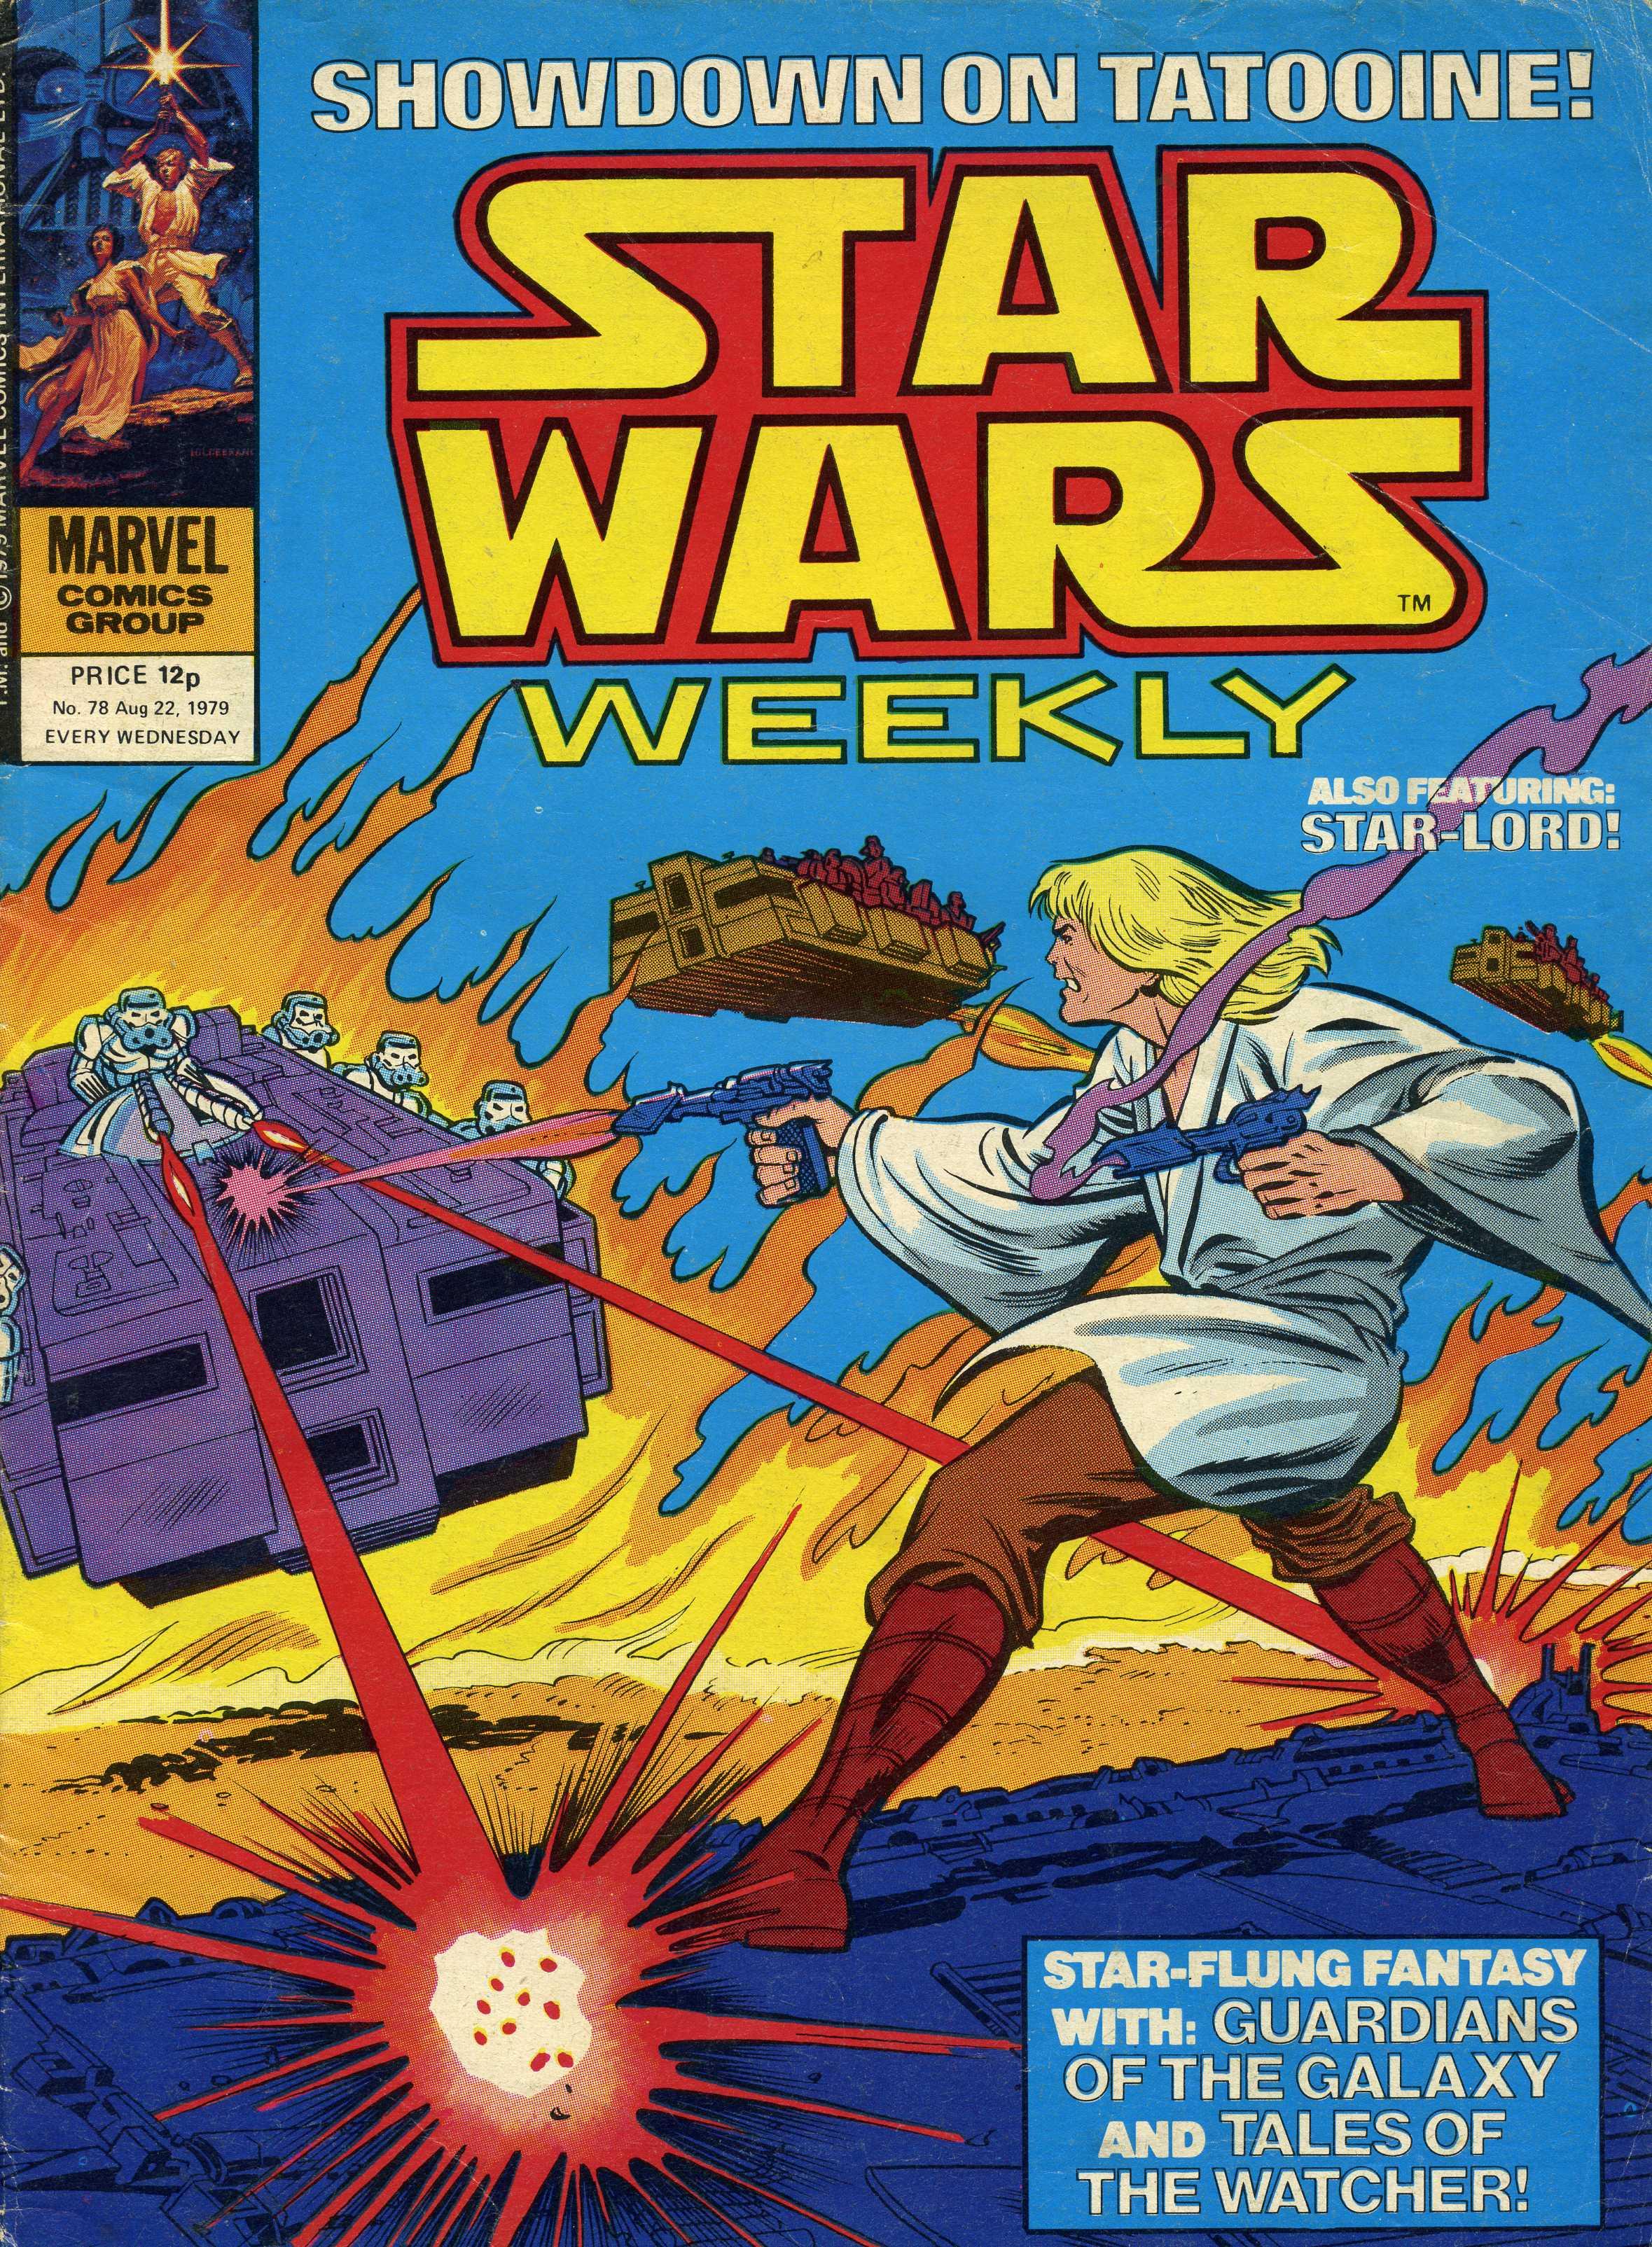 Star Wars Weekly 78